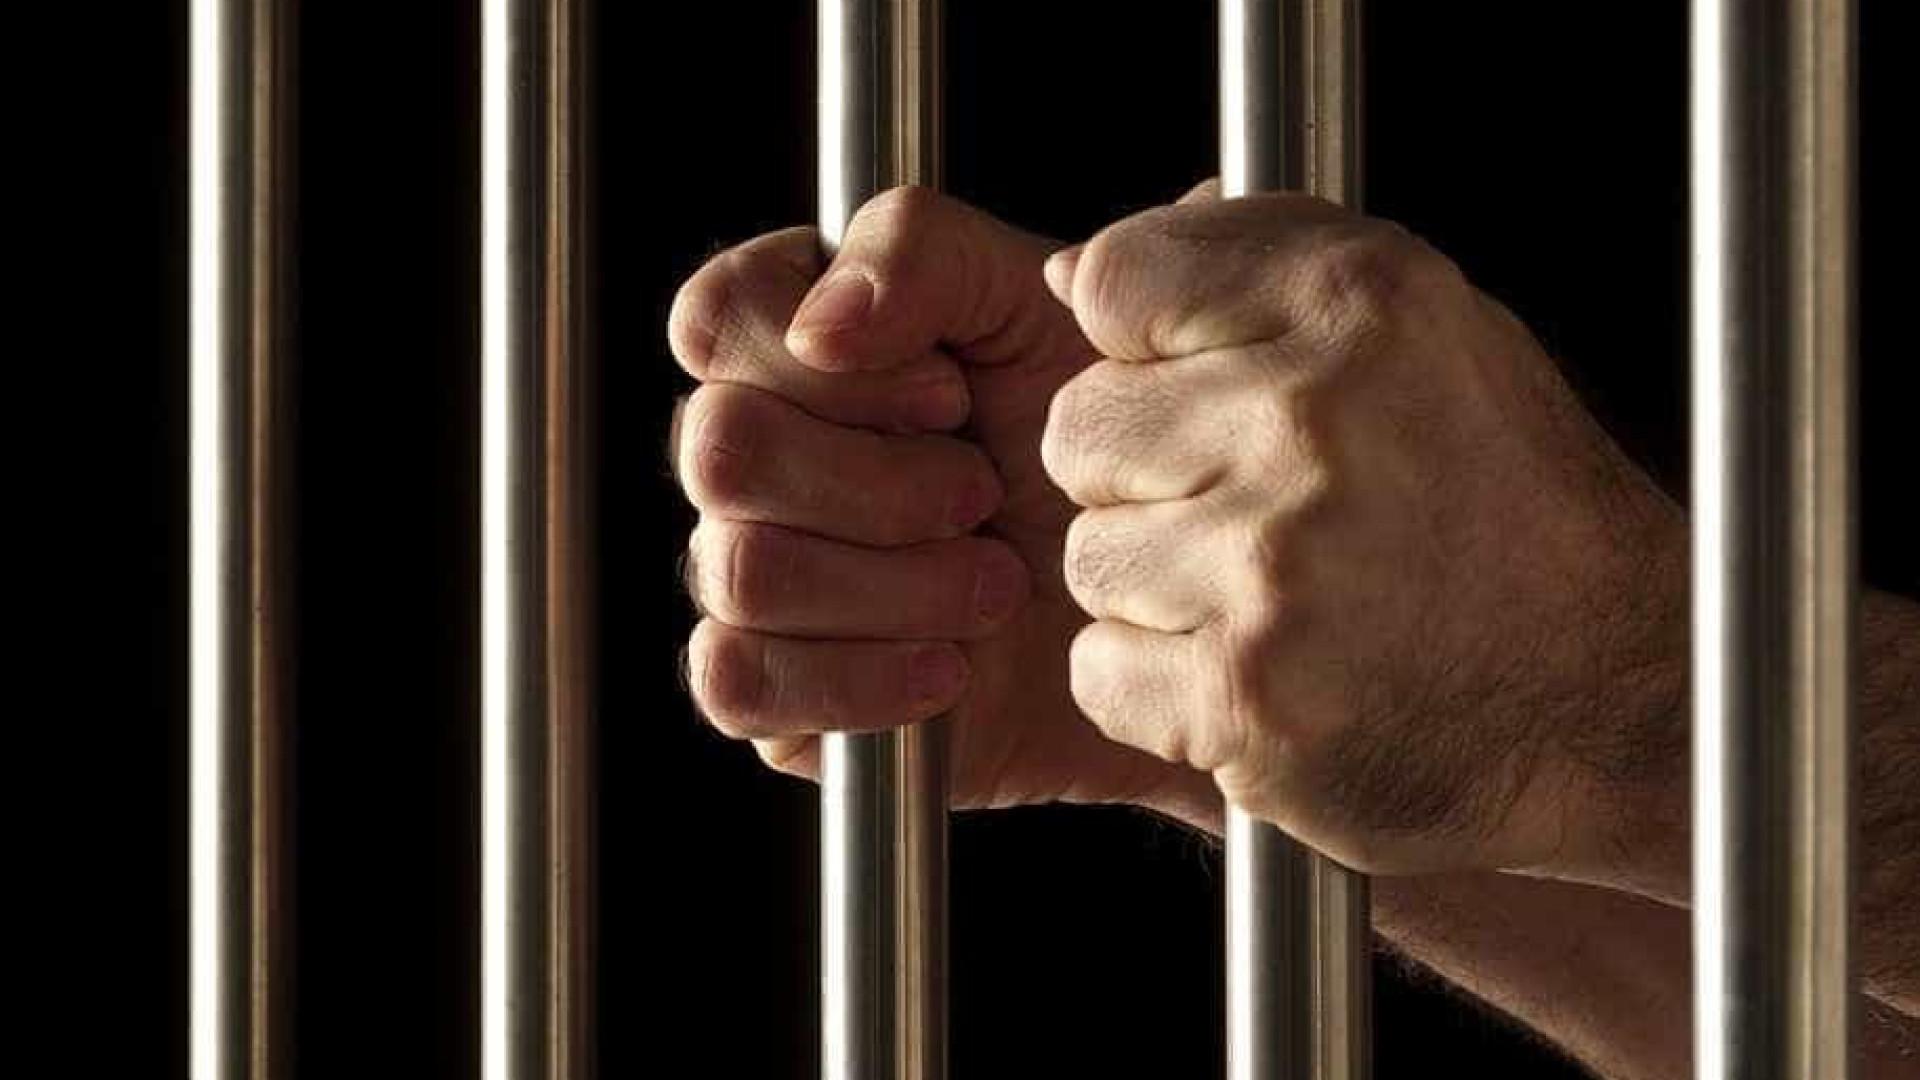 Coronavírus: Depen estima que 30 mil saíram da prisão